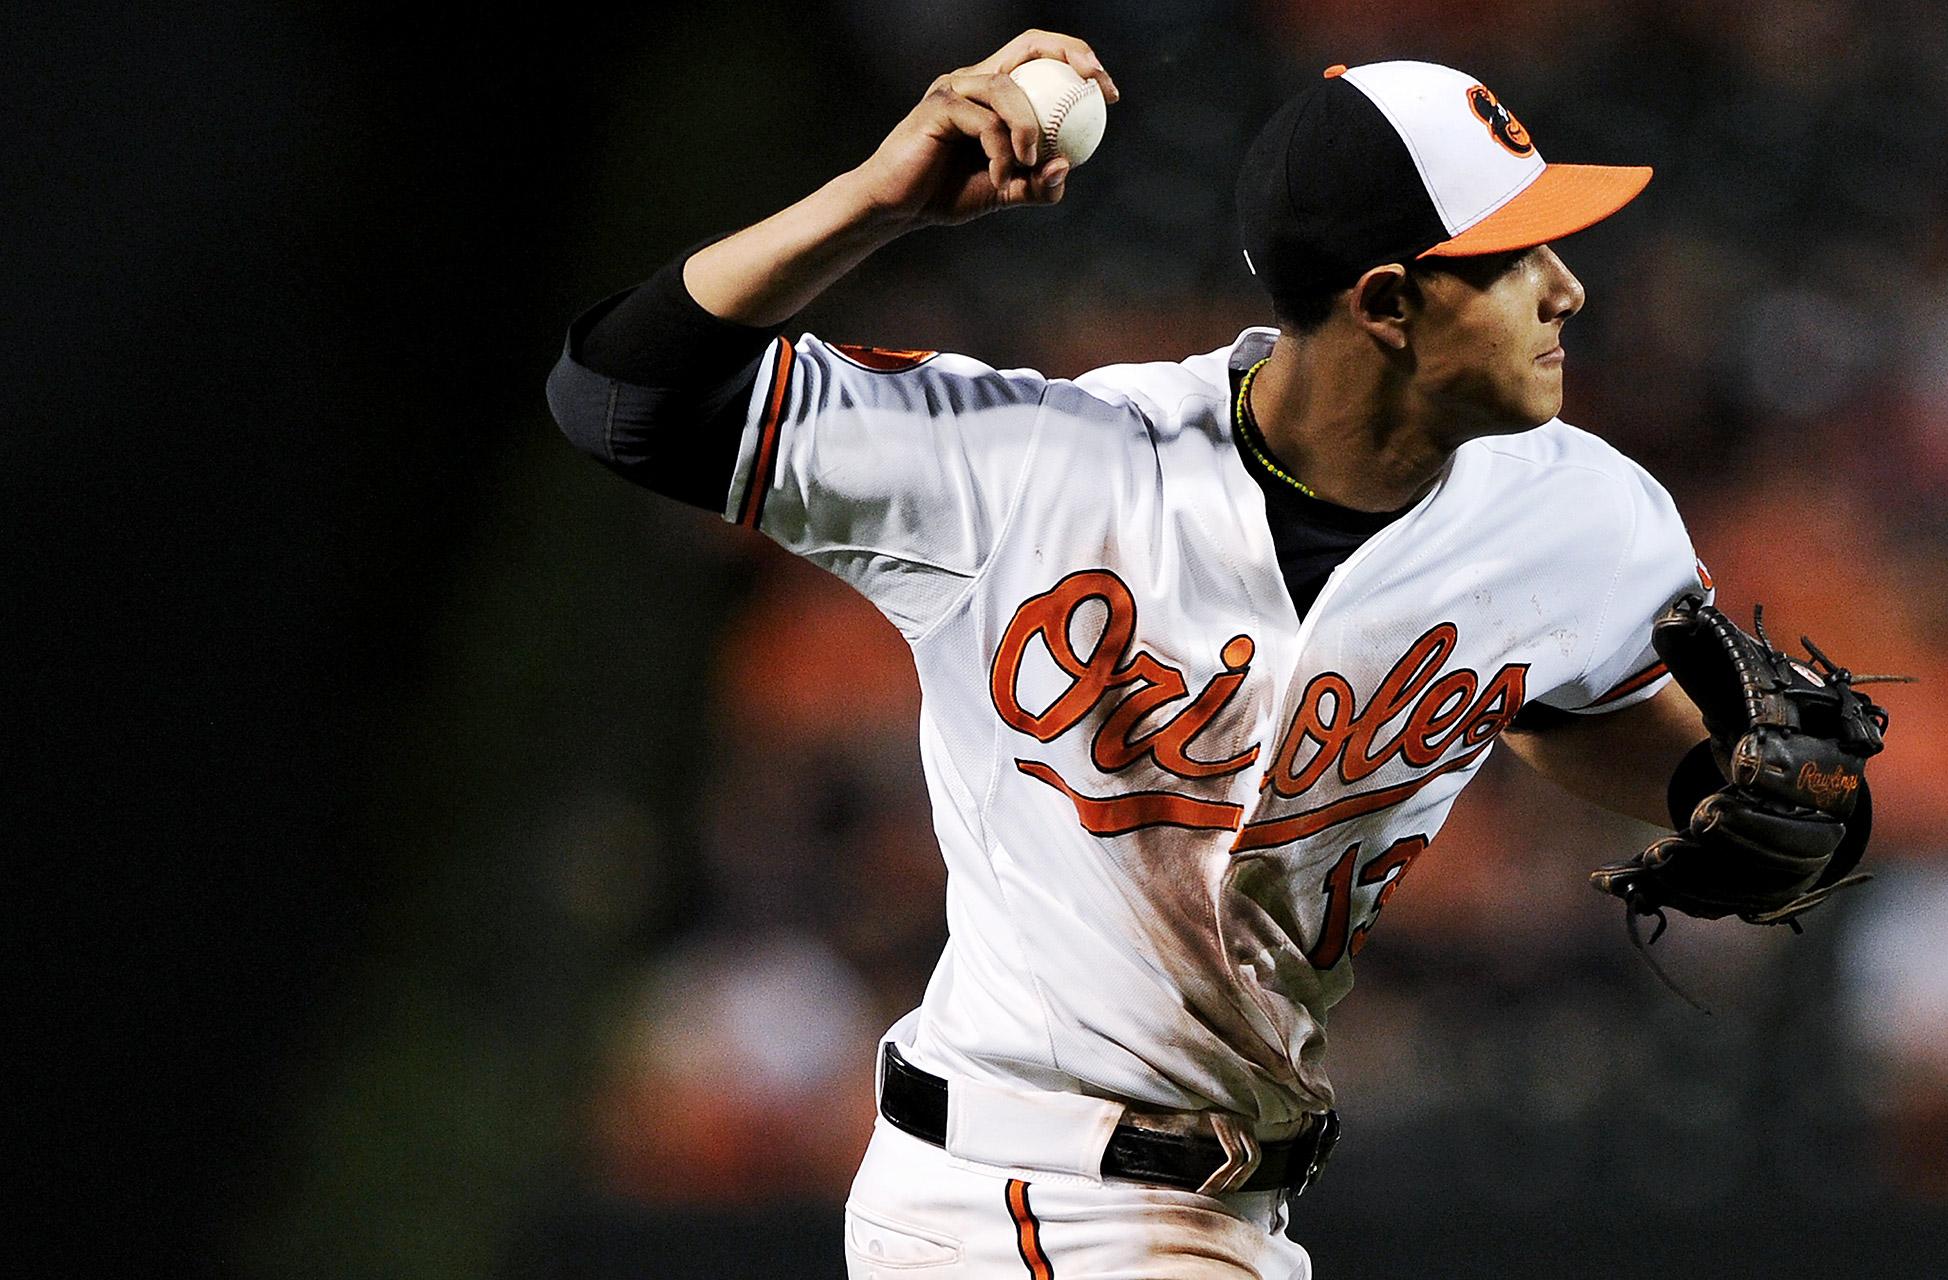 5. Manny Machado, 3B, Orioles